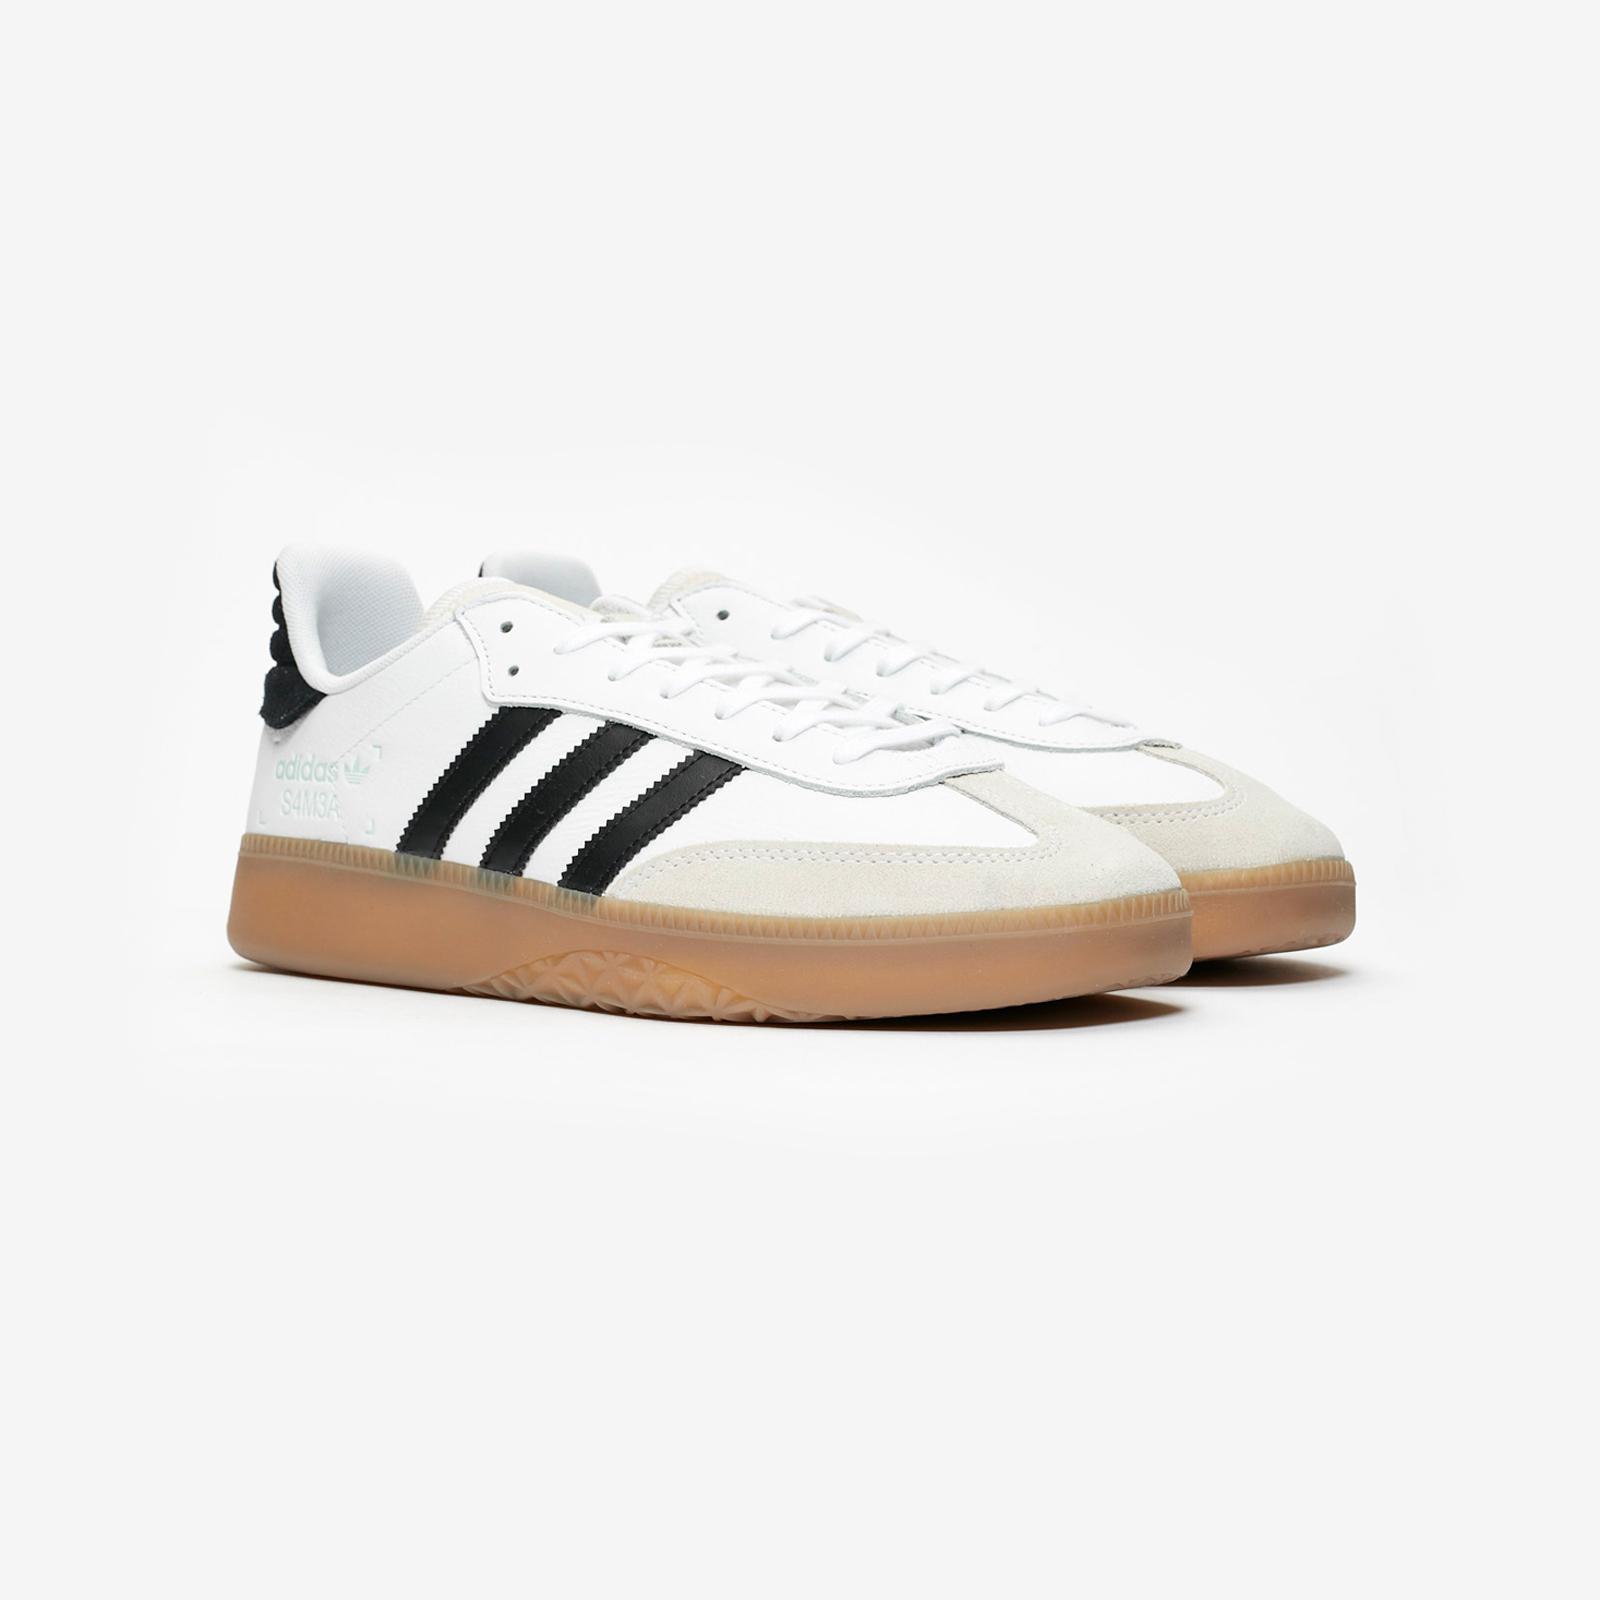 b904f28172c adidas Samba RM - Bd7537 - Sneakersnstuff | sneakers & streetwear ...